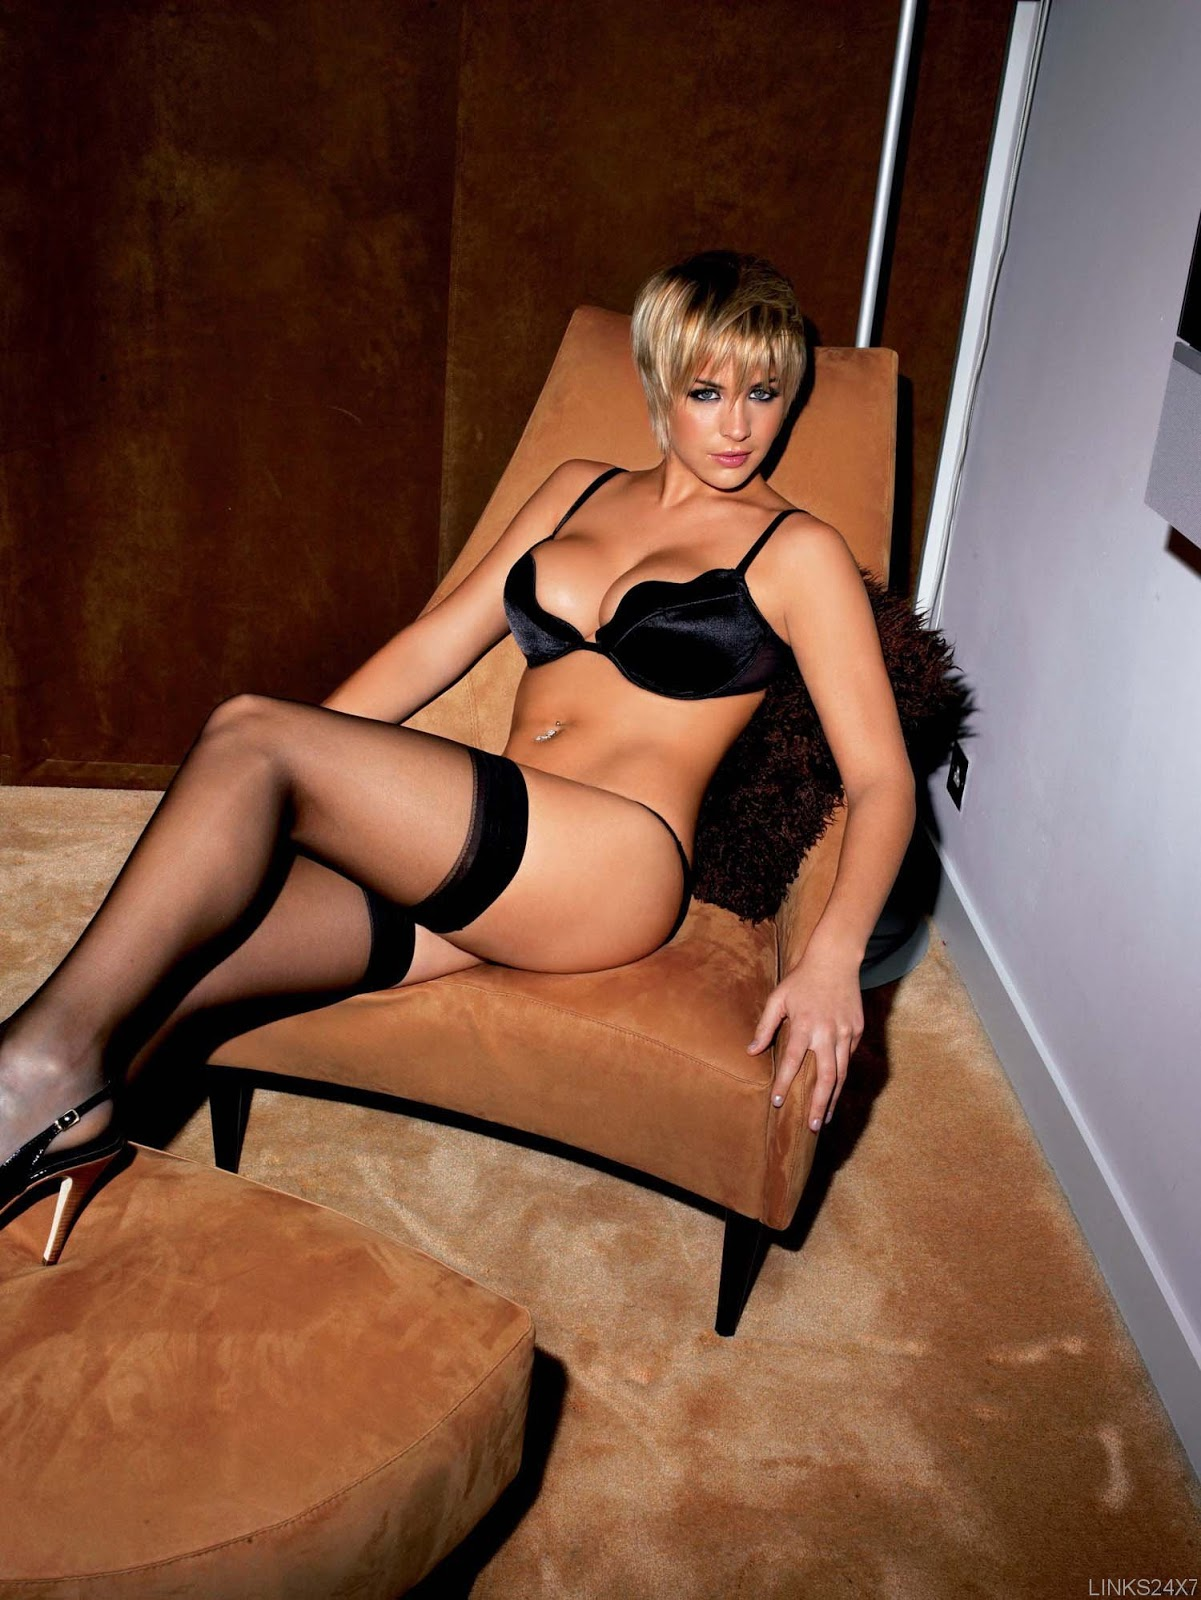 Gemma Atkinson hot pics